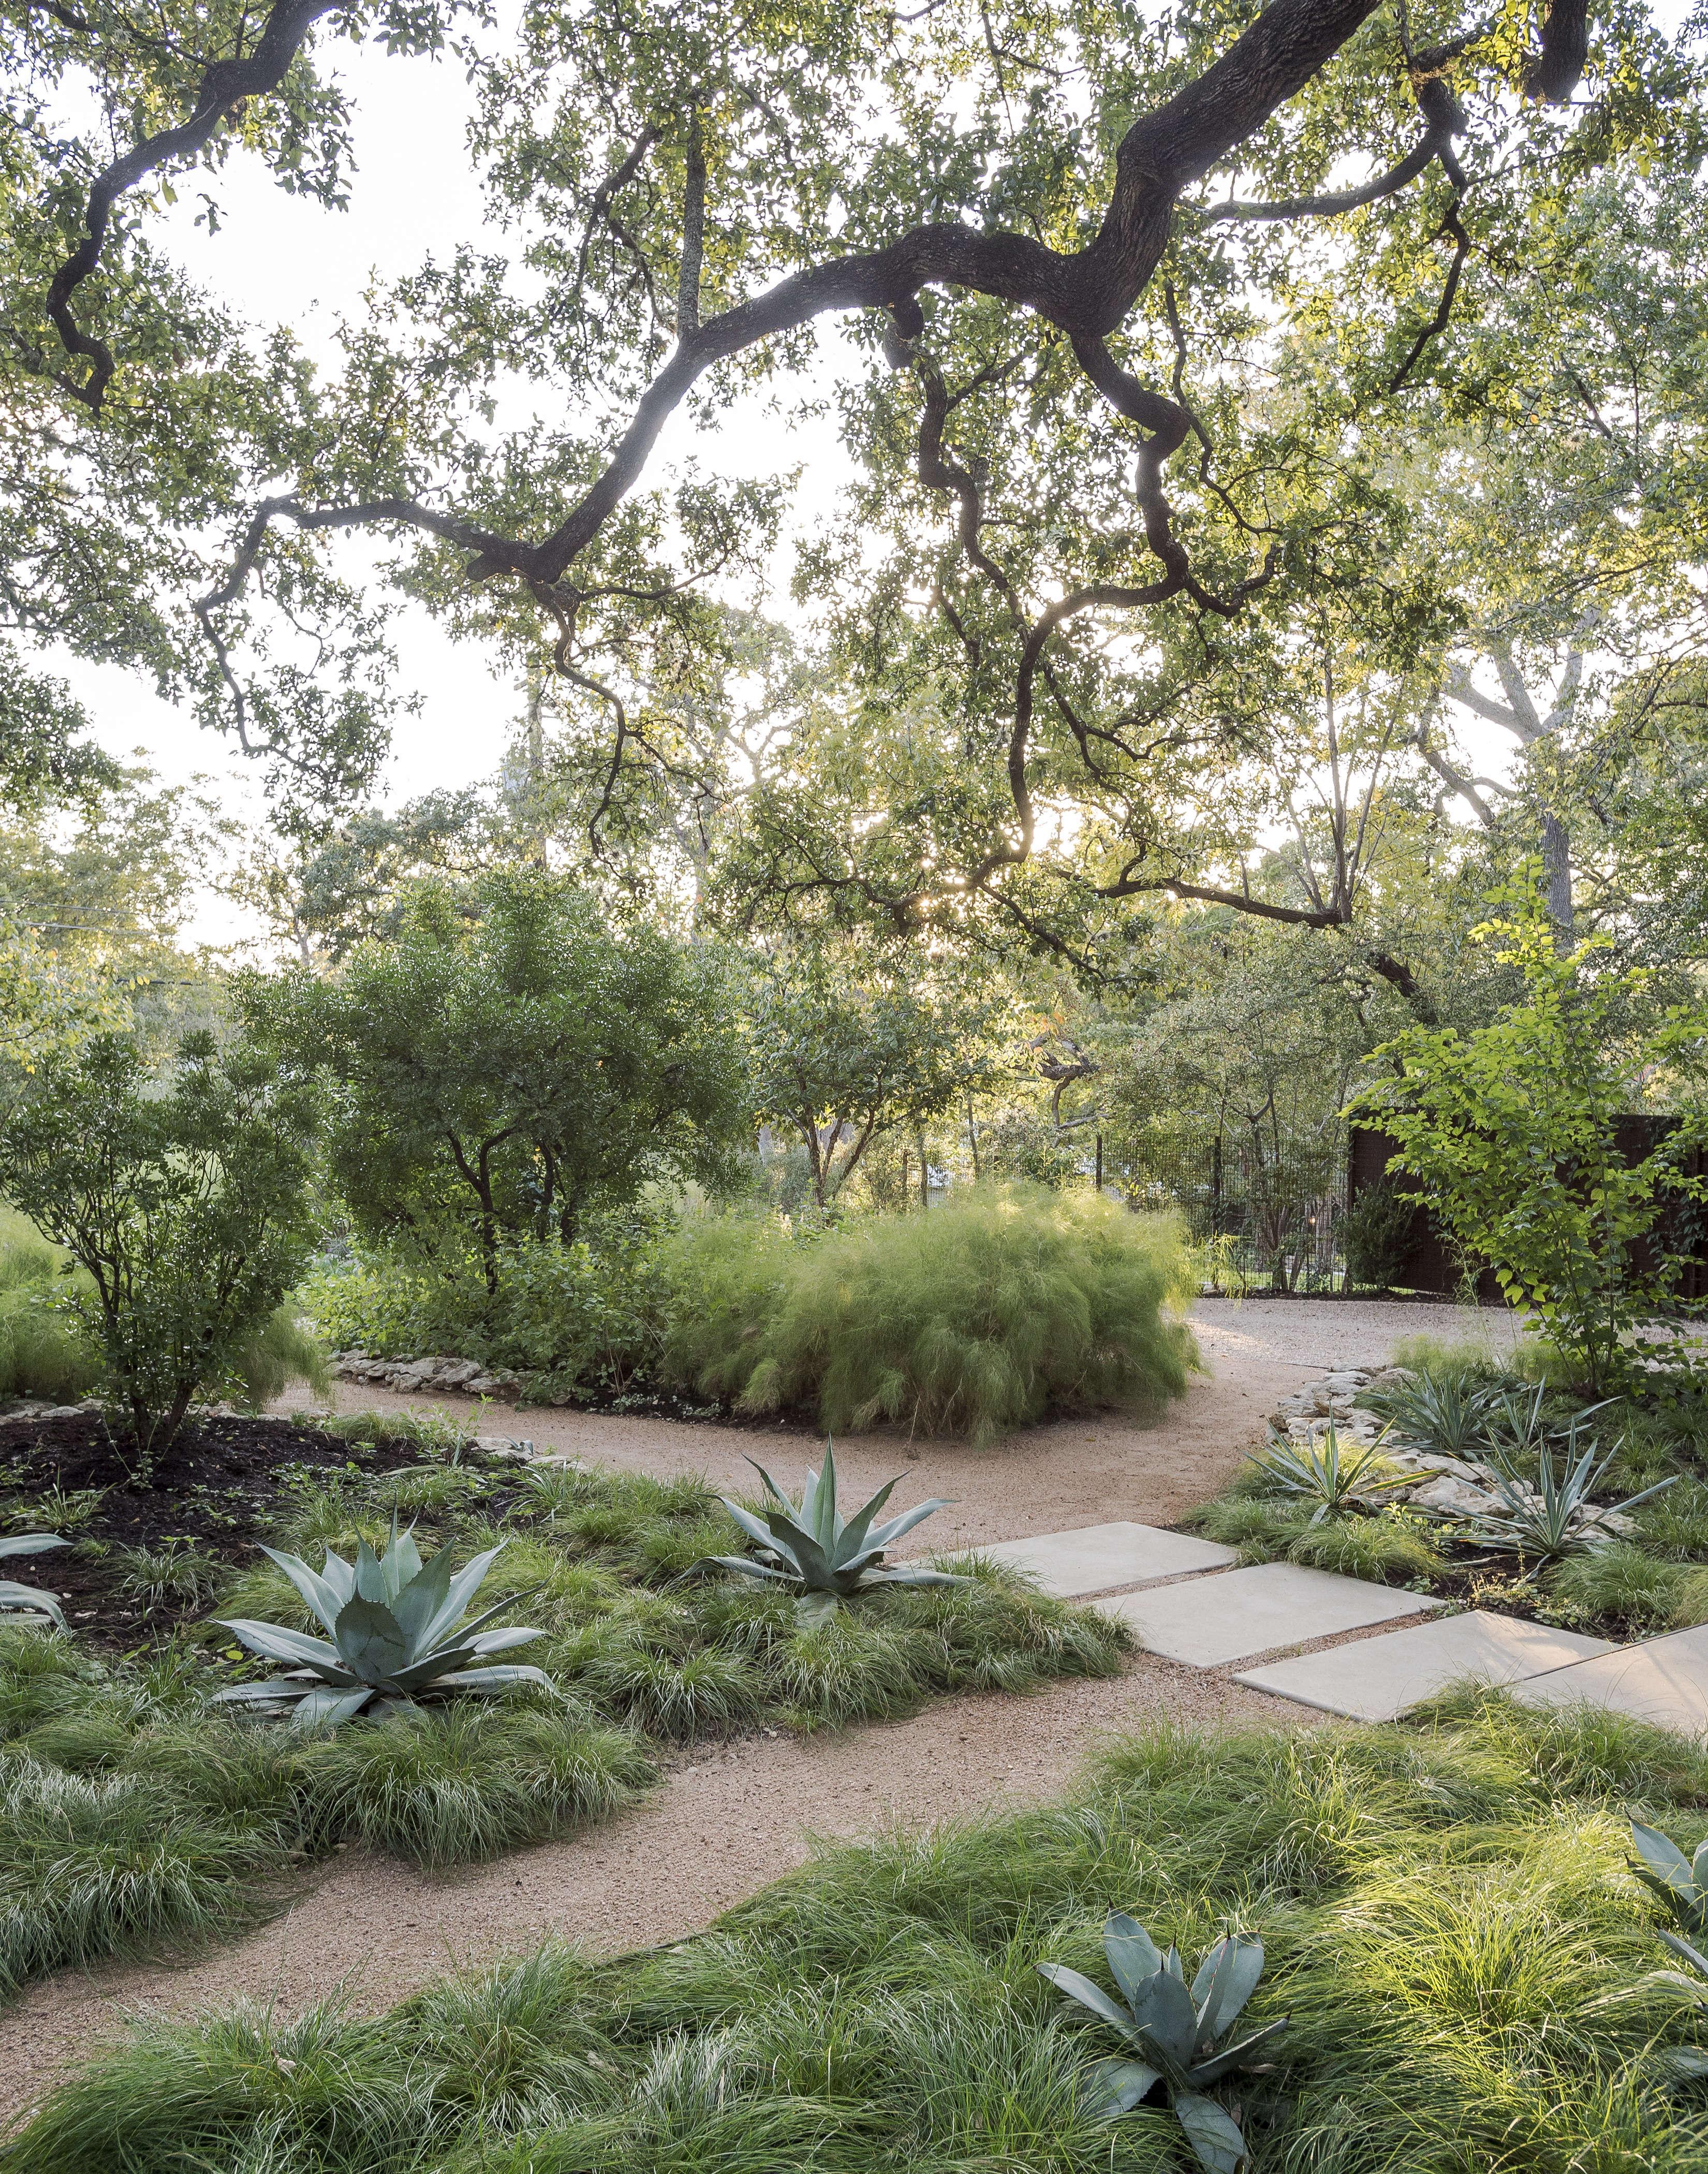 Photograph by Matthew Williams for Gardenista.